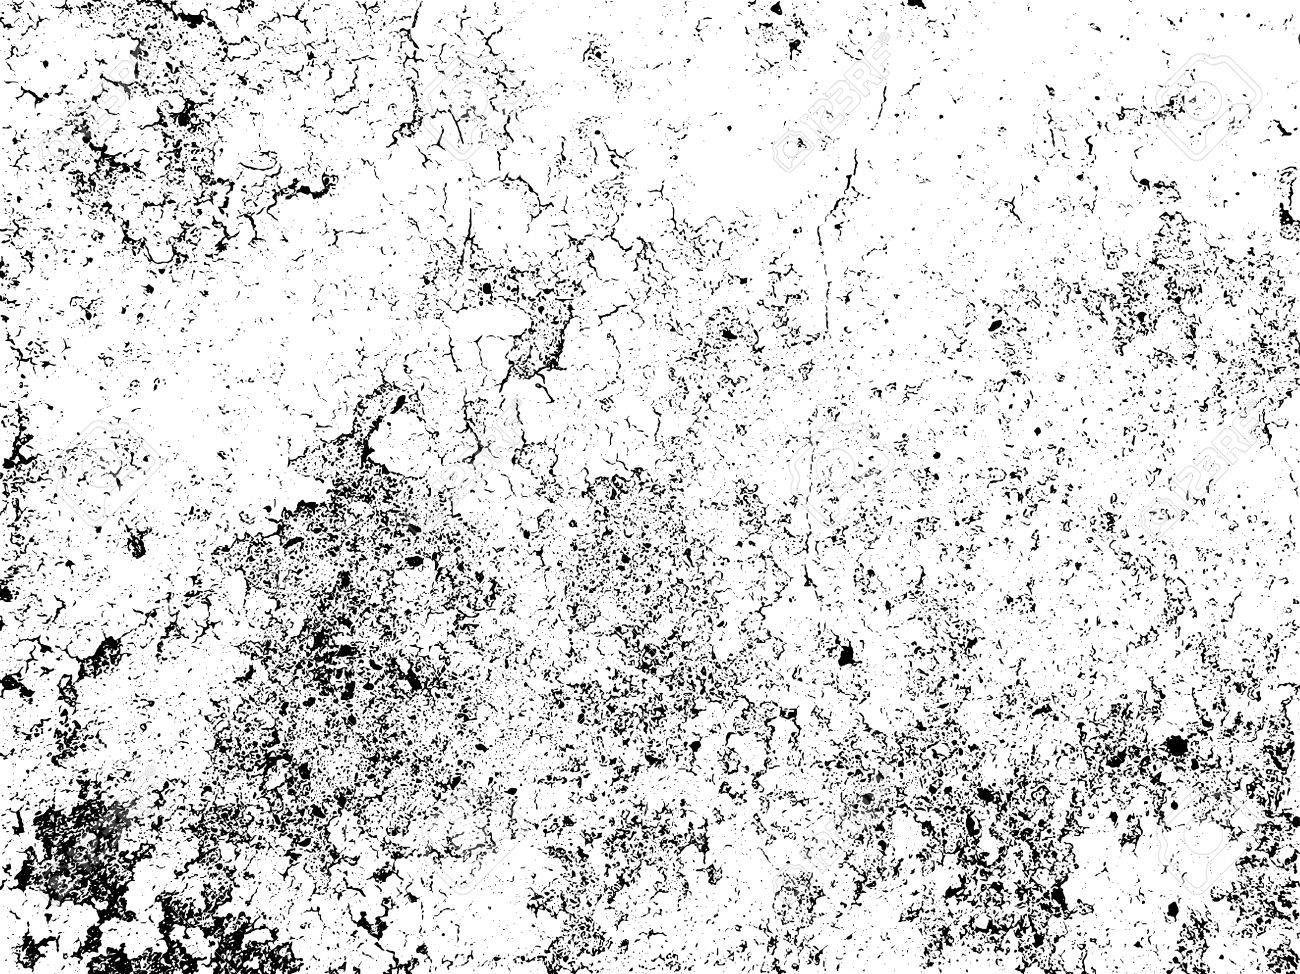 hight resolution of grunge clipart grunge texture 16 1300 x 974 dumielauxepices net